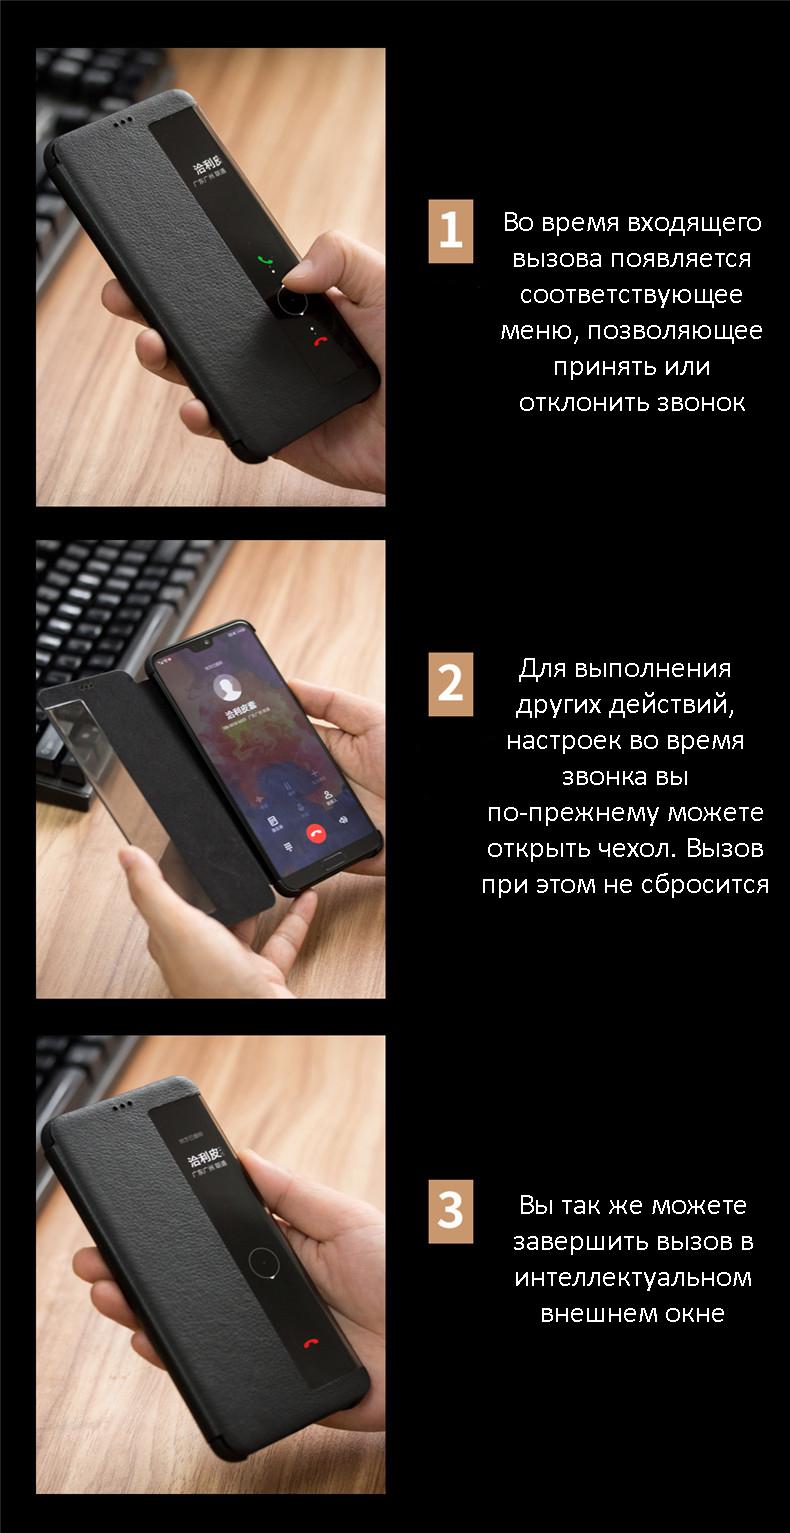 kozhanyj chehol dlja huawei p20 huawei p20 pro s intellektualnym jekranom 07 - Кожаный чехол для Huawei P20/ Huawei P20 Pro с интеллектуальным экраном